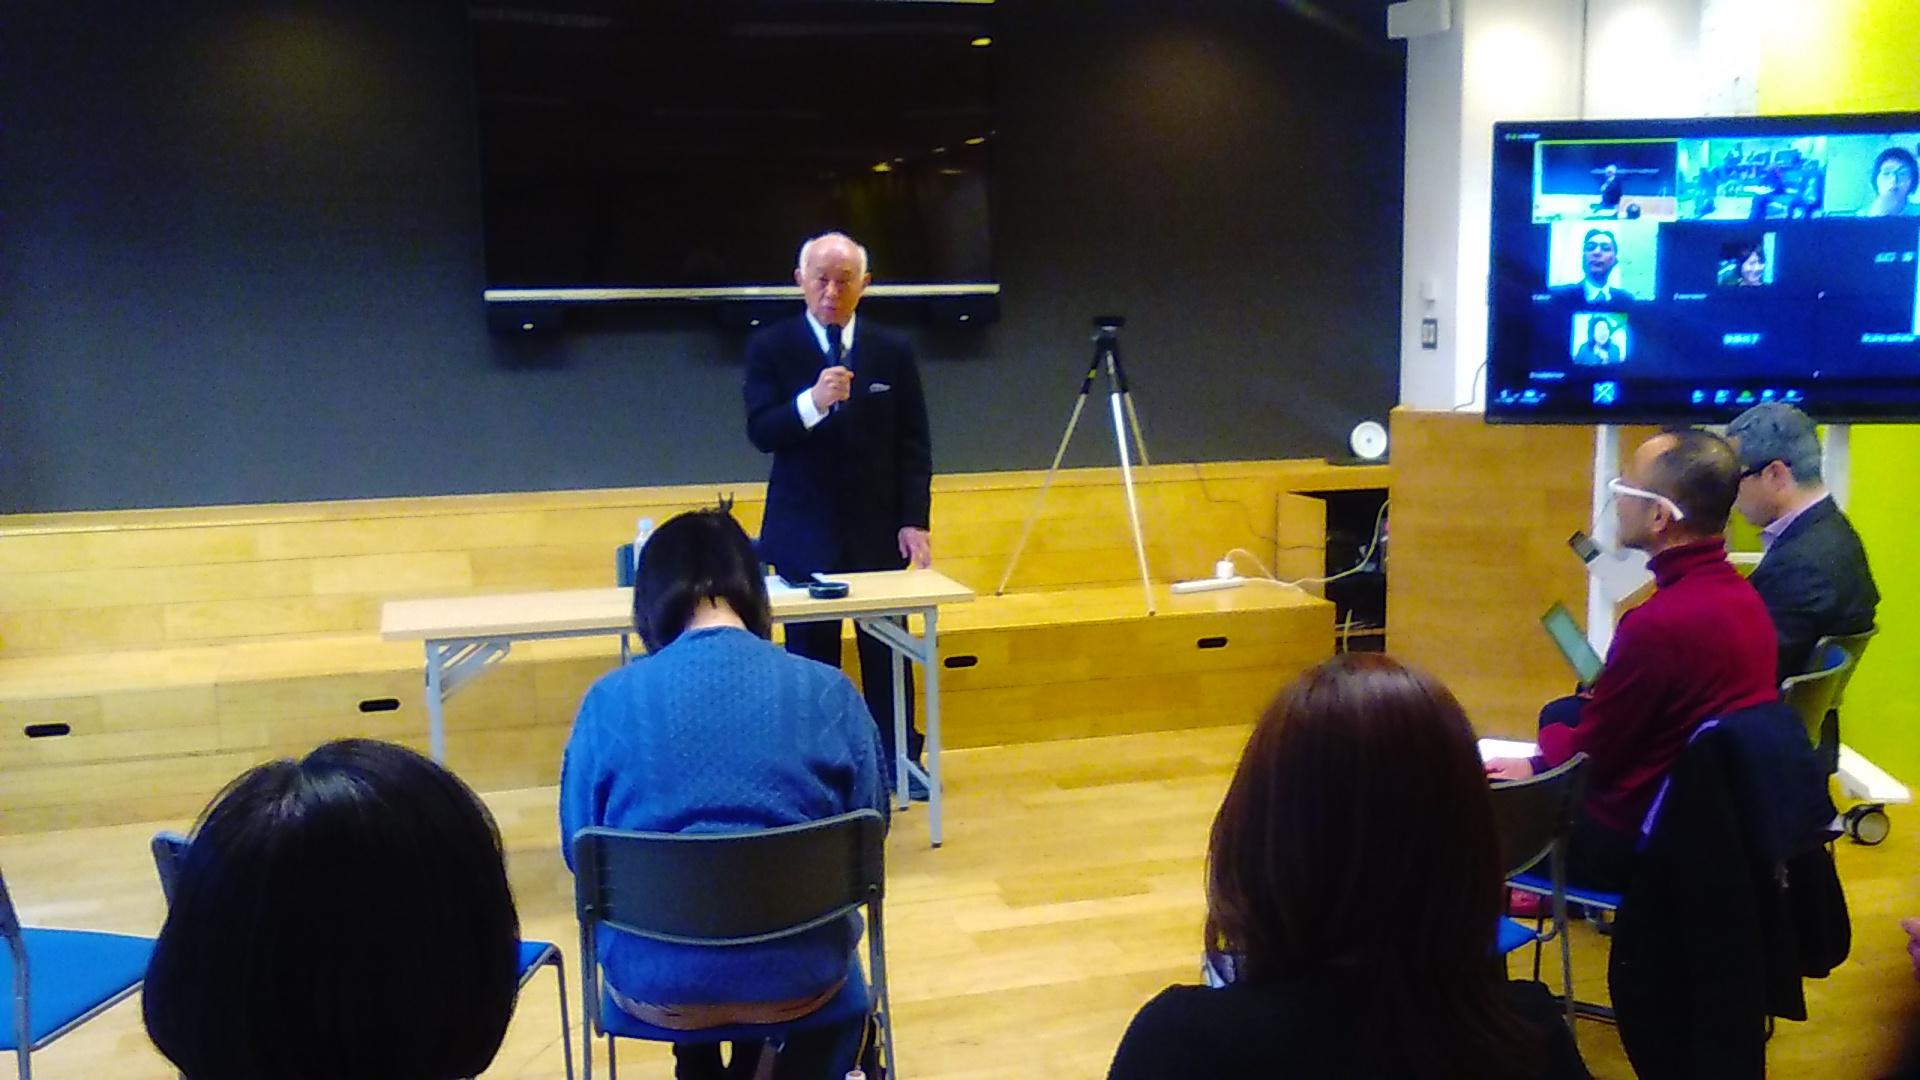 KIMG1477 - 100年続く美しい会プロジェクトでは 2月7日(金)松前兼一講師「存在感と透明感」をテーマに講演